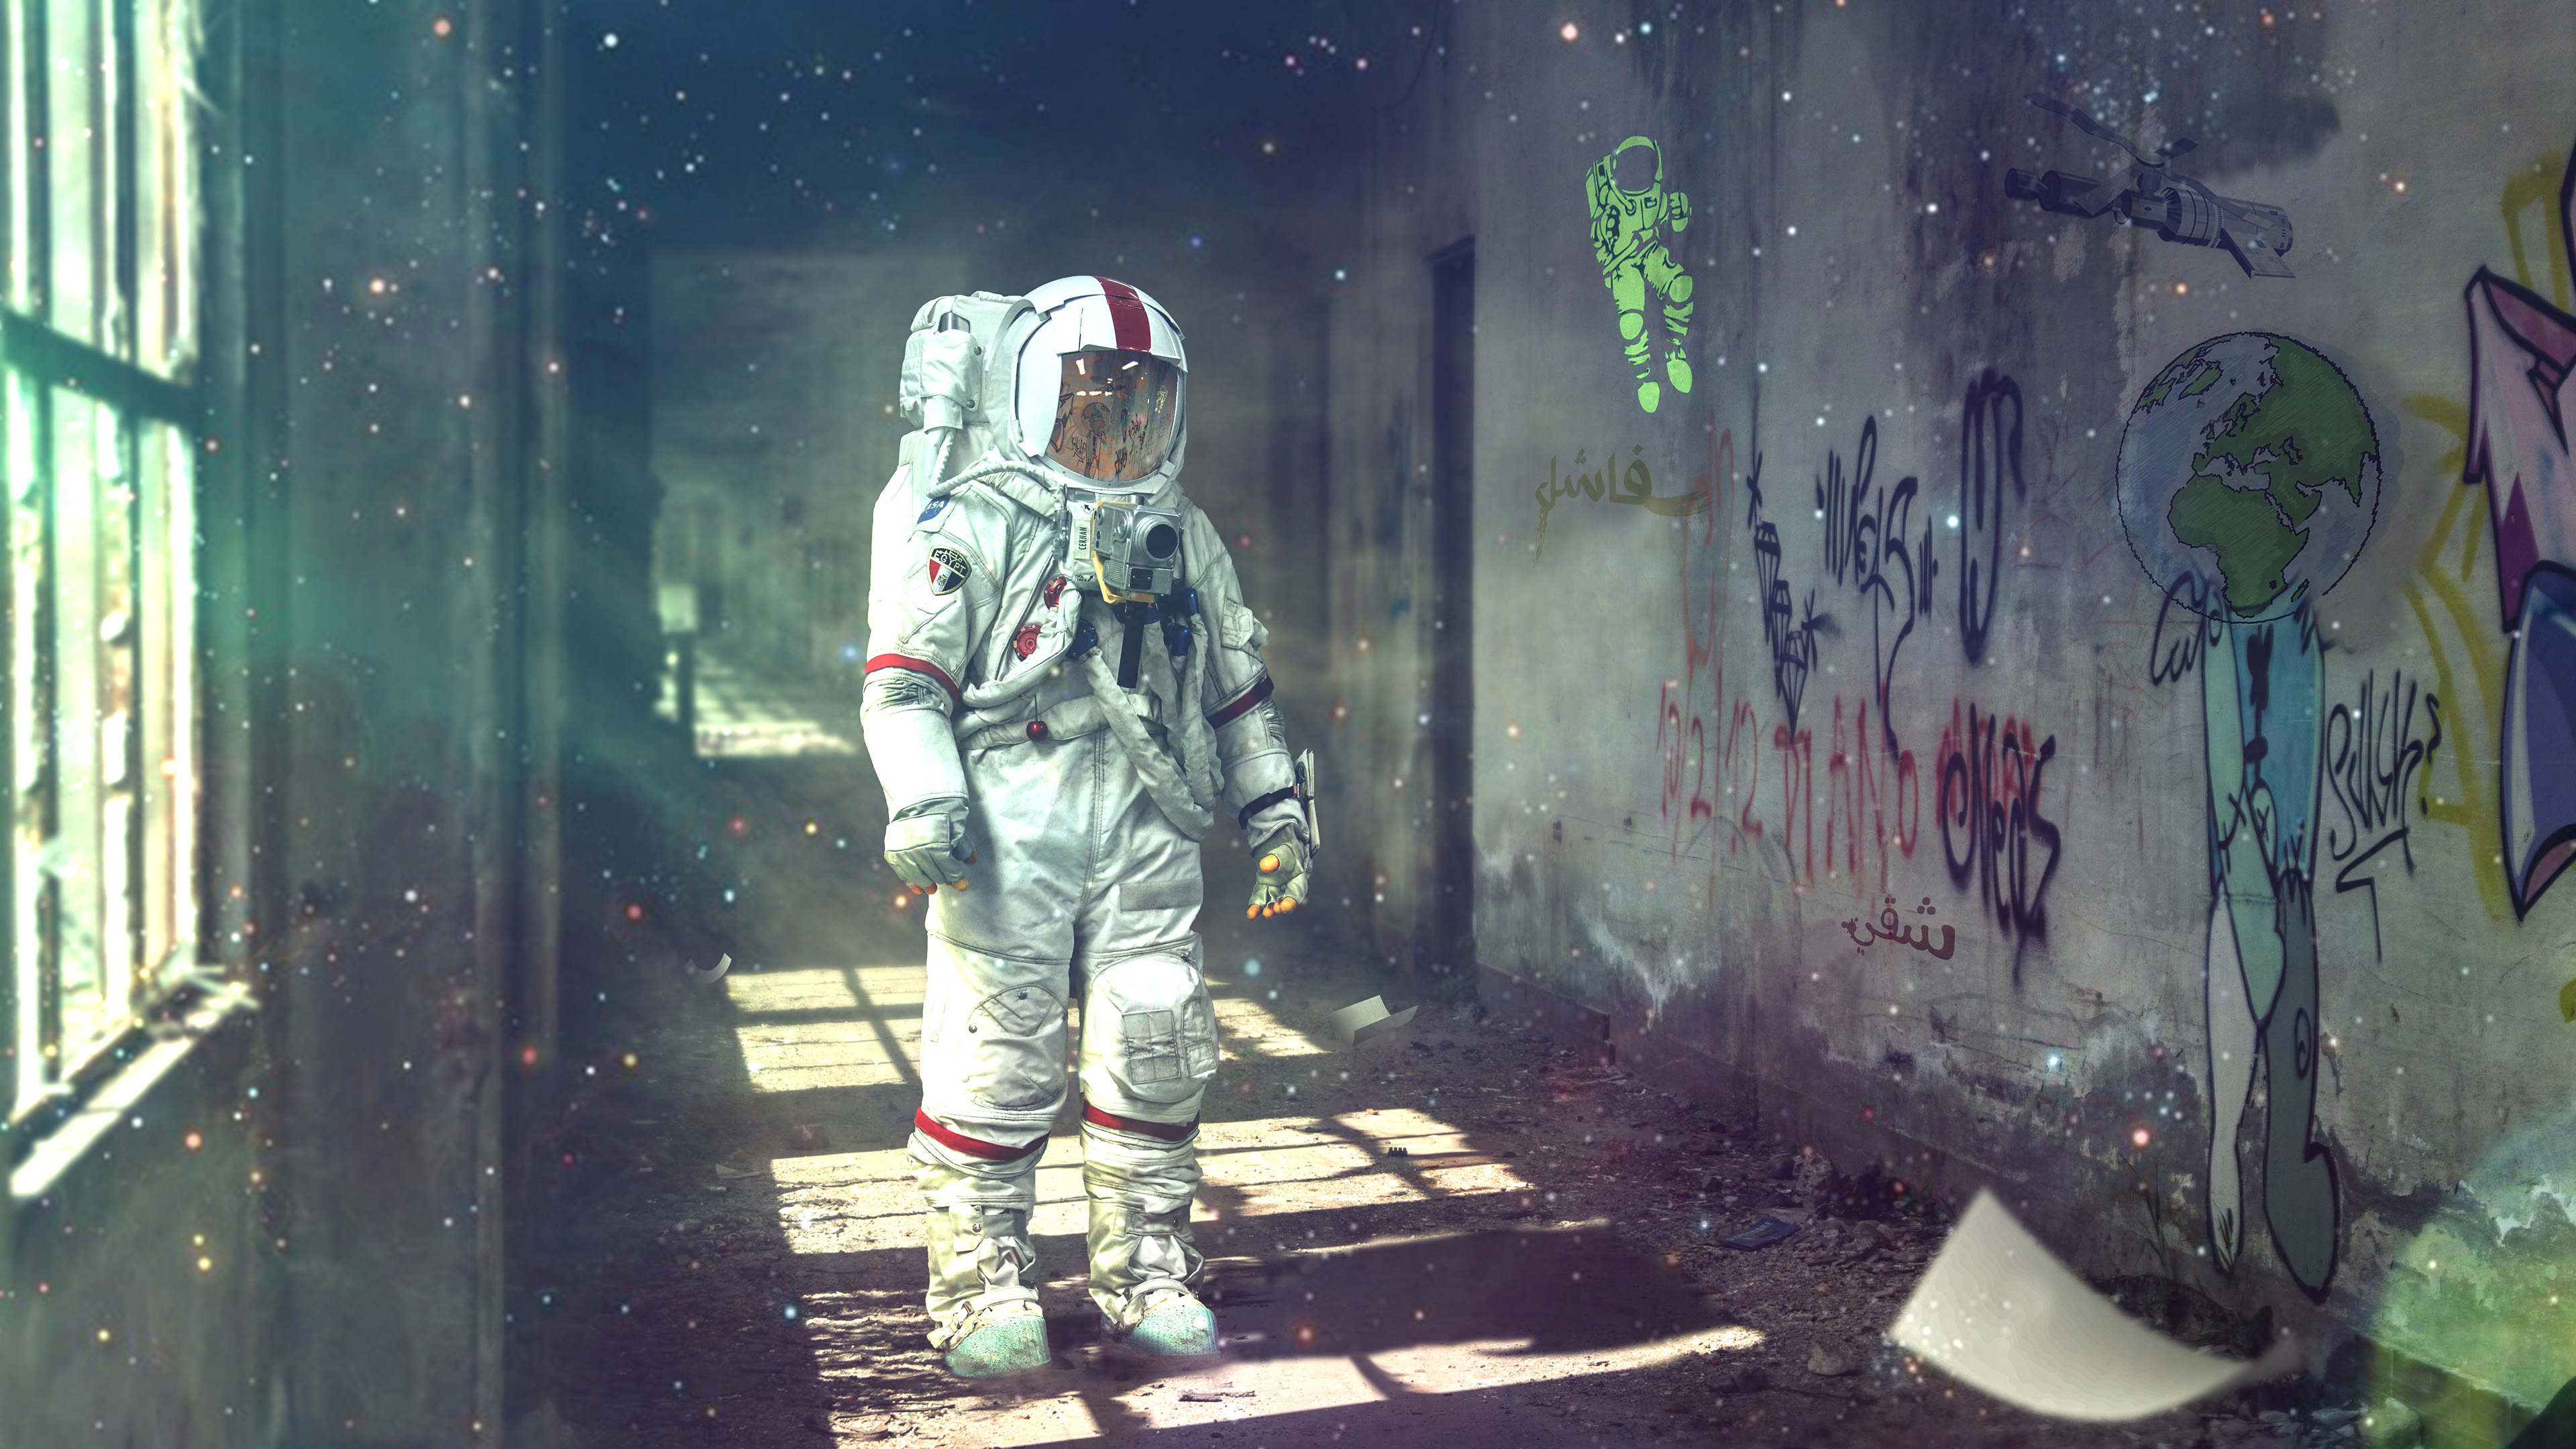 Astronaut Dream 4k Wallpapers